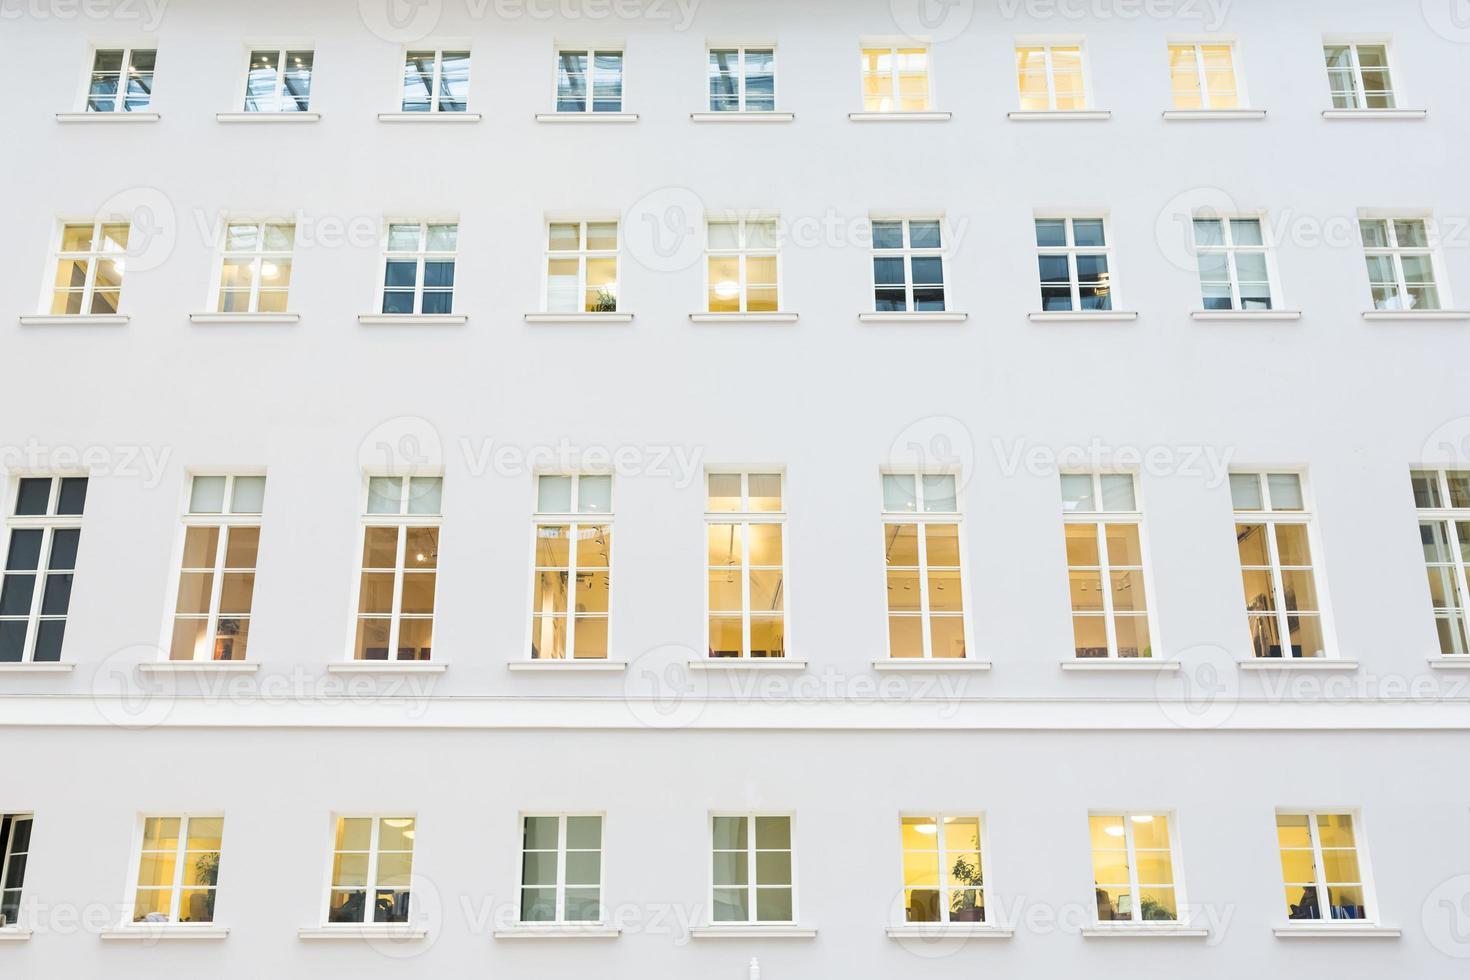 Windows on the facade of a modern building photo